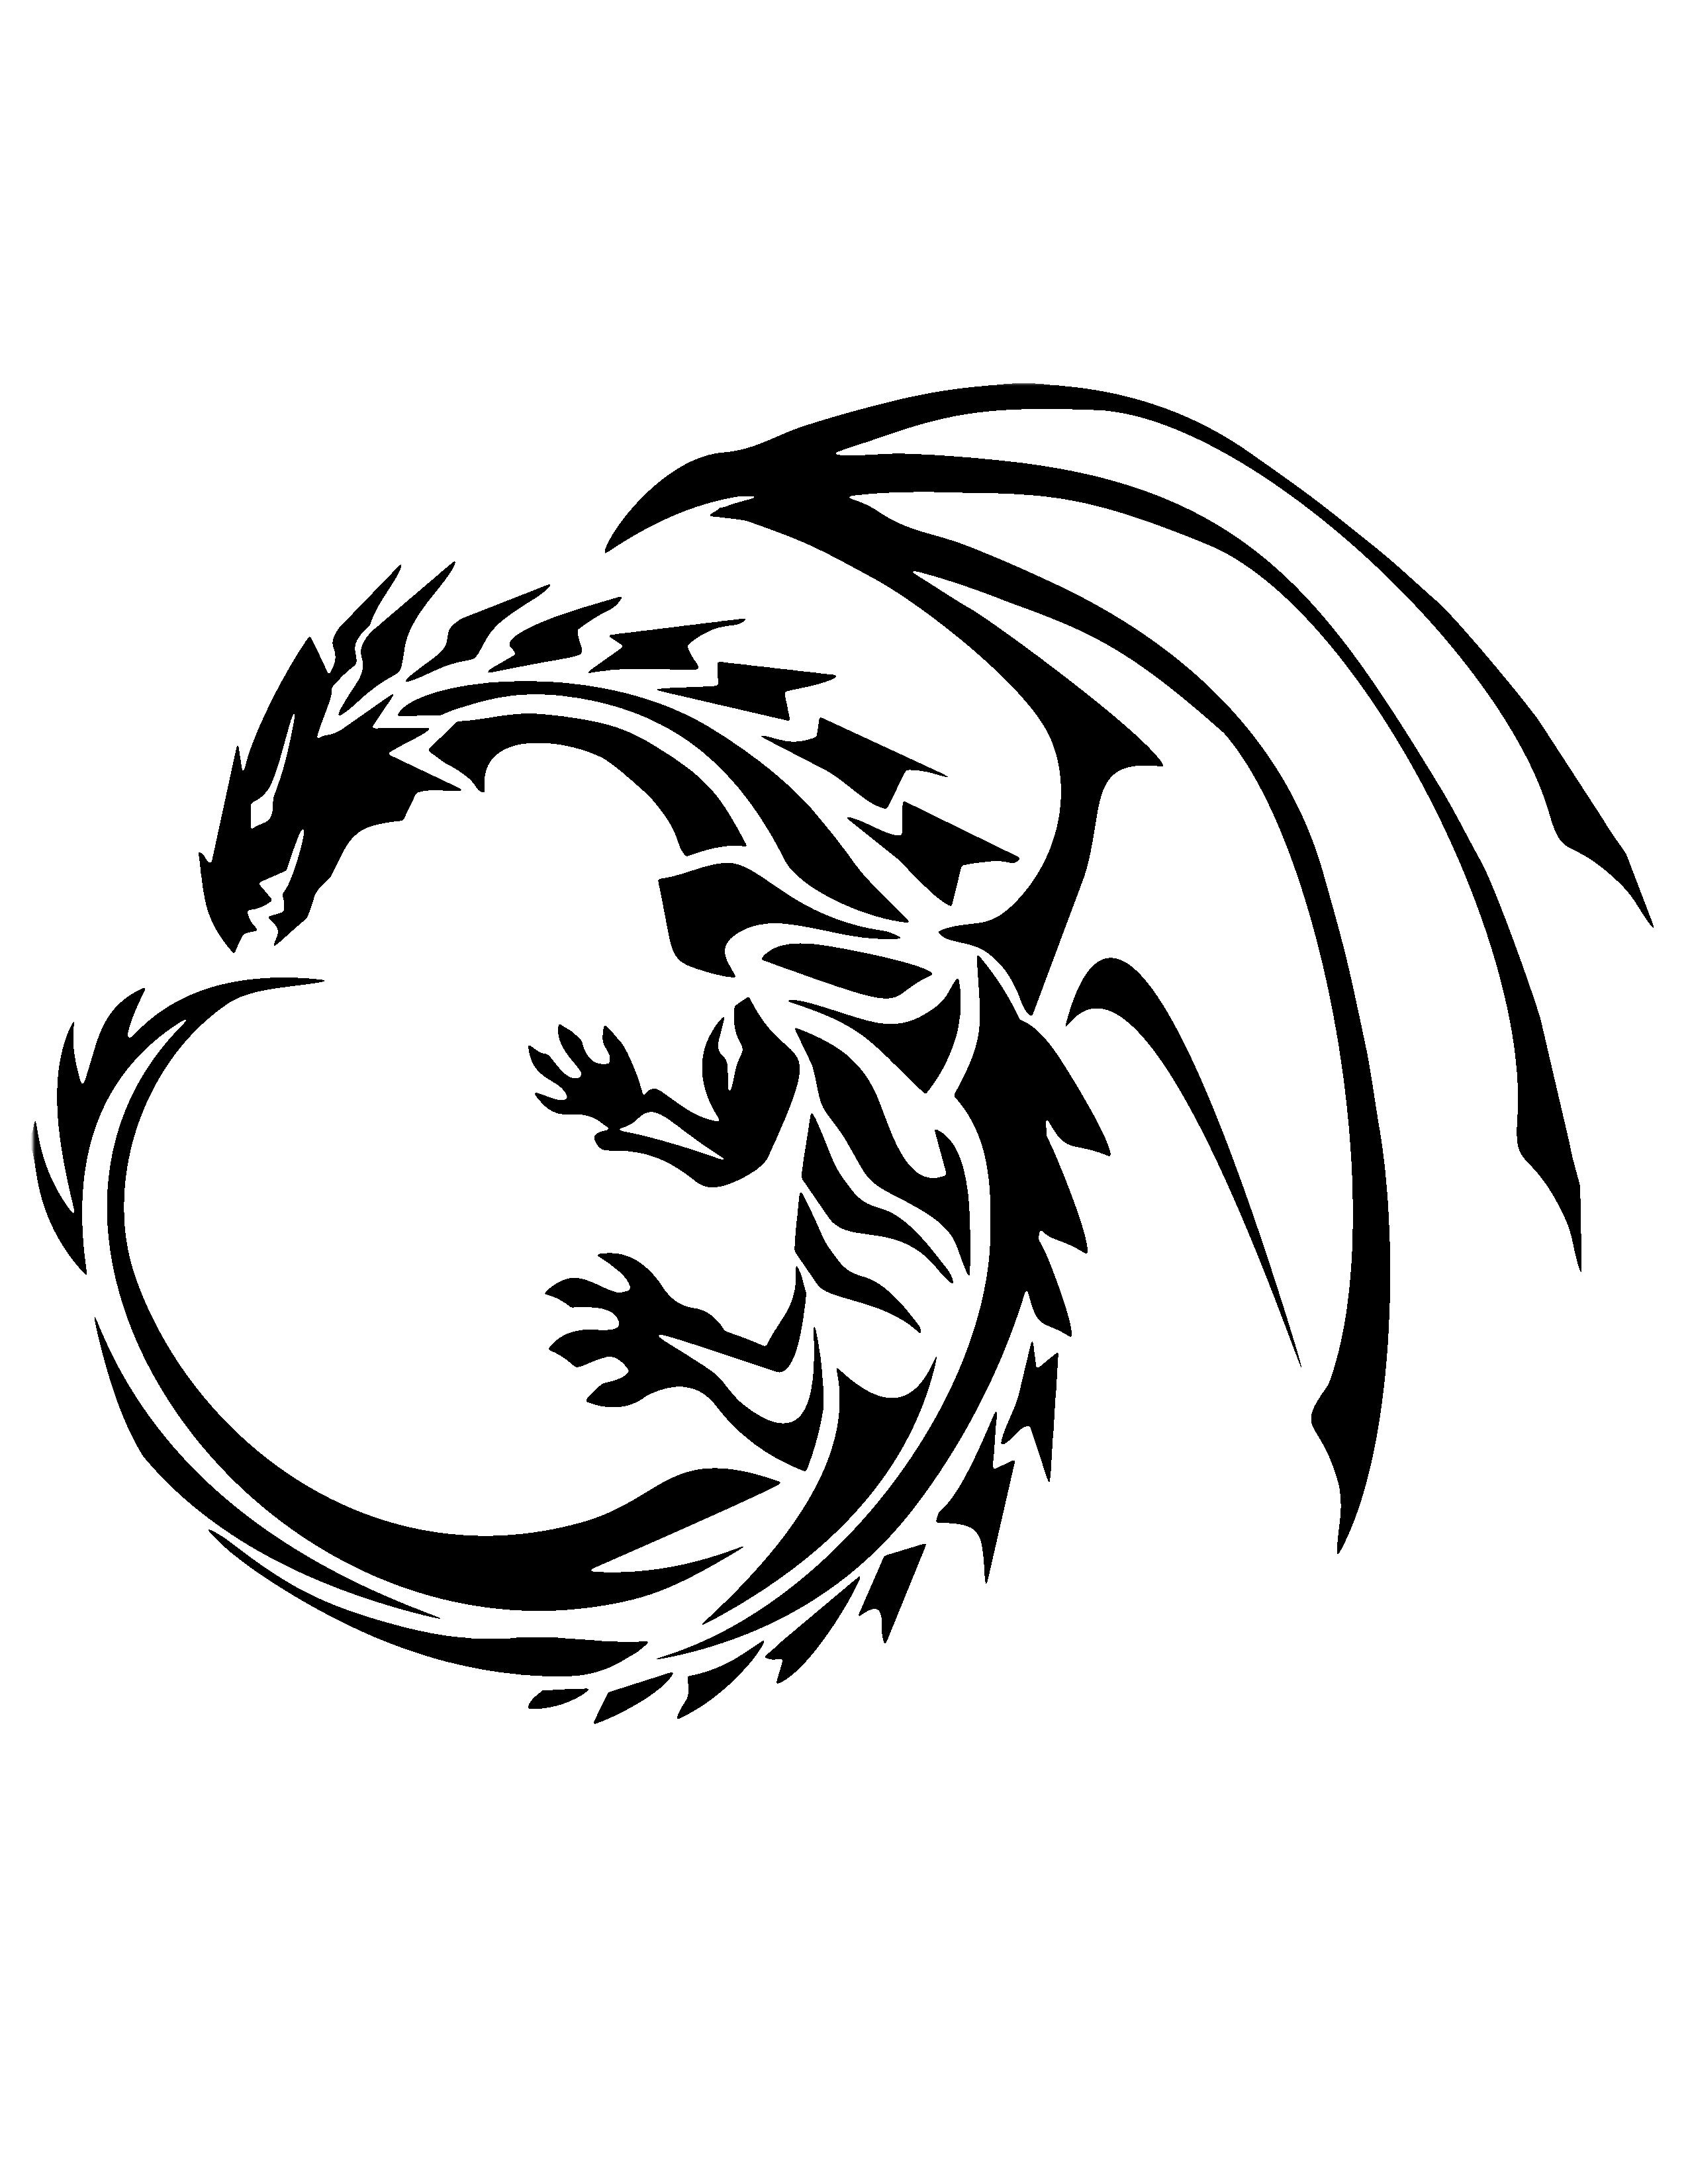 Dragon Stencil | Stencils | Tribal Dragon Tattoos, Tribal Tattoos - Free Printable Dragon Stencils